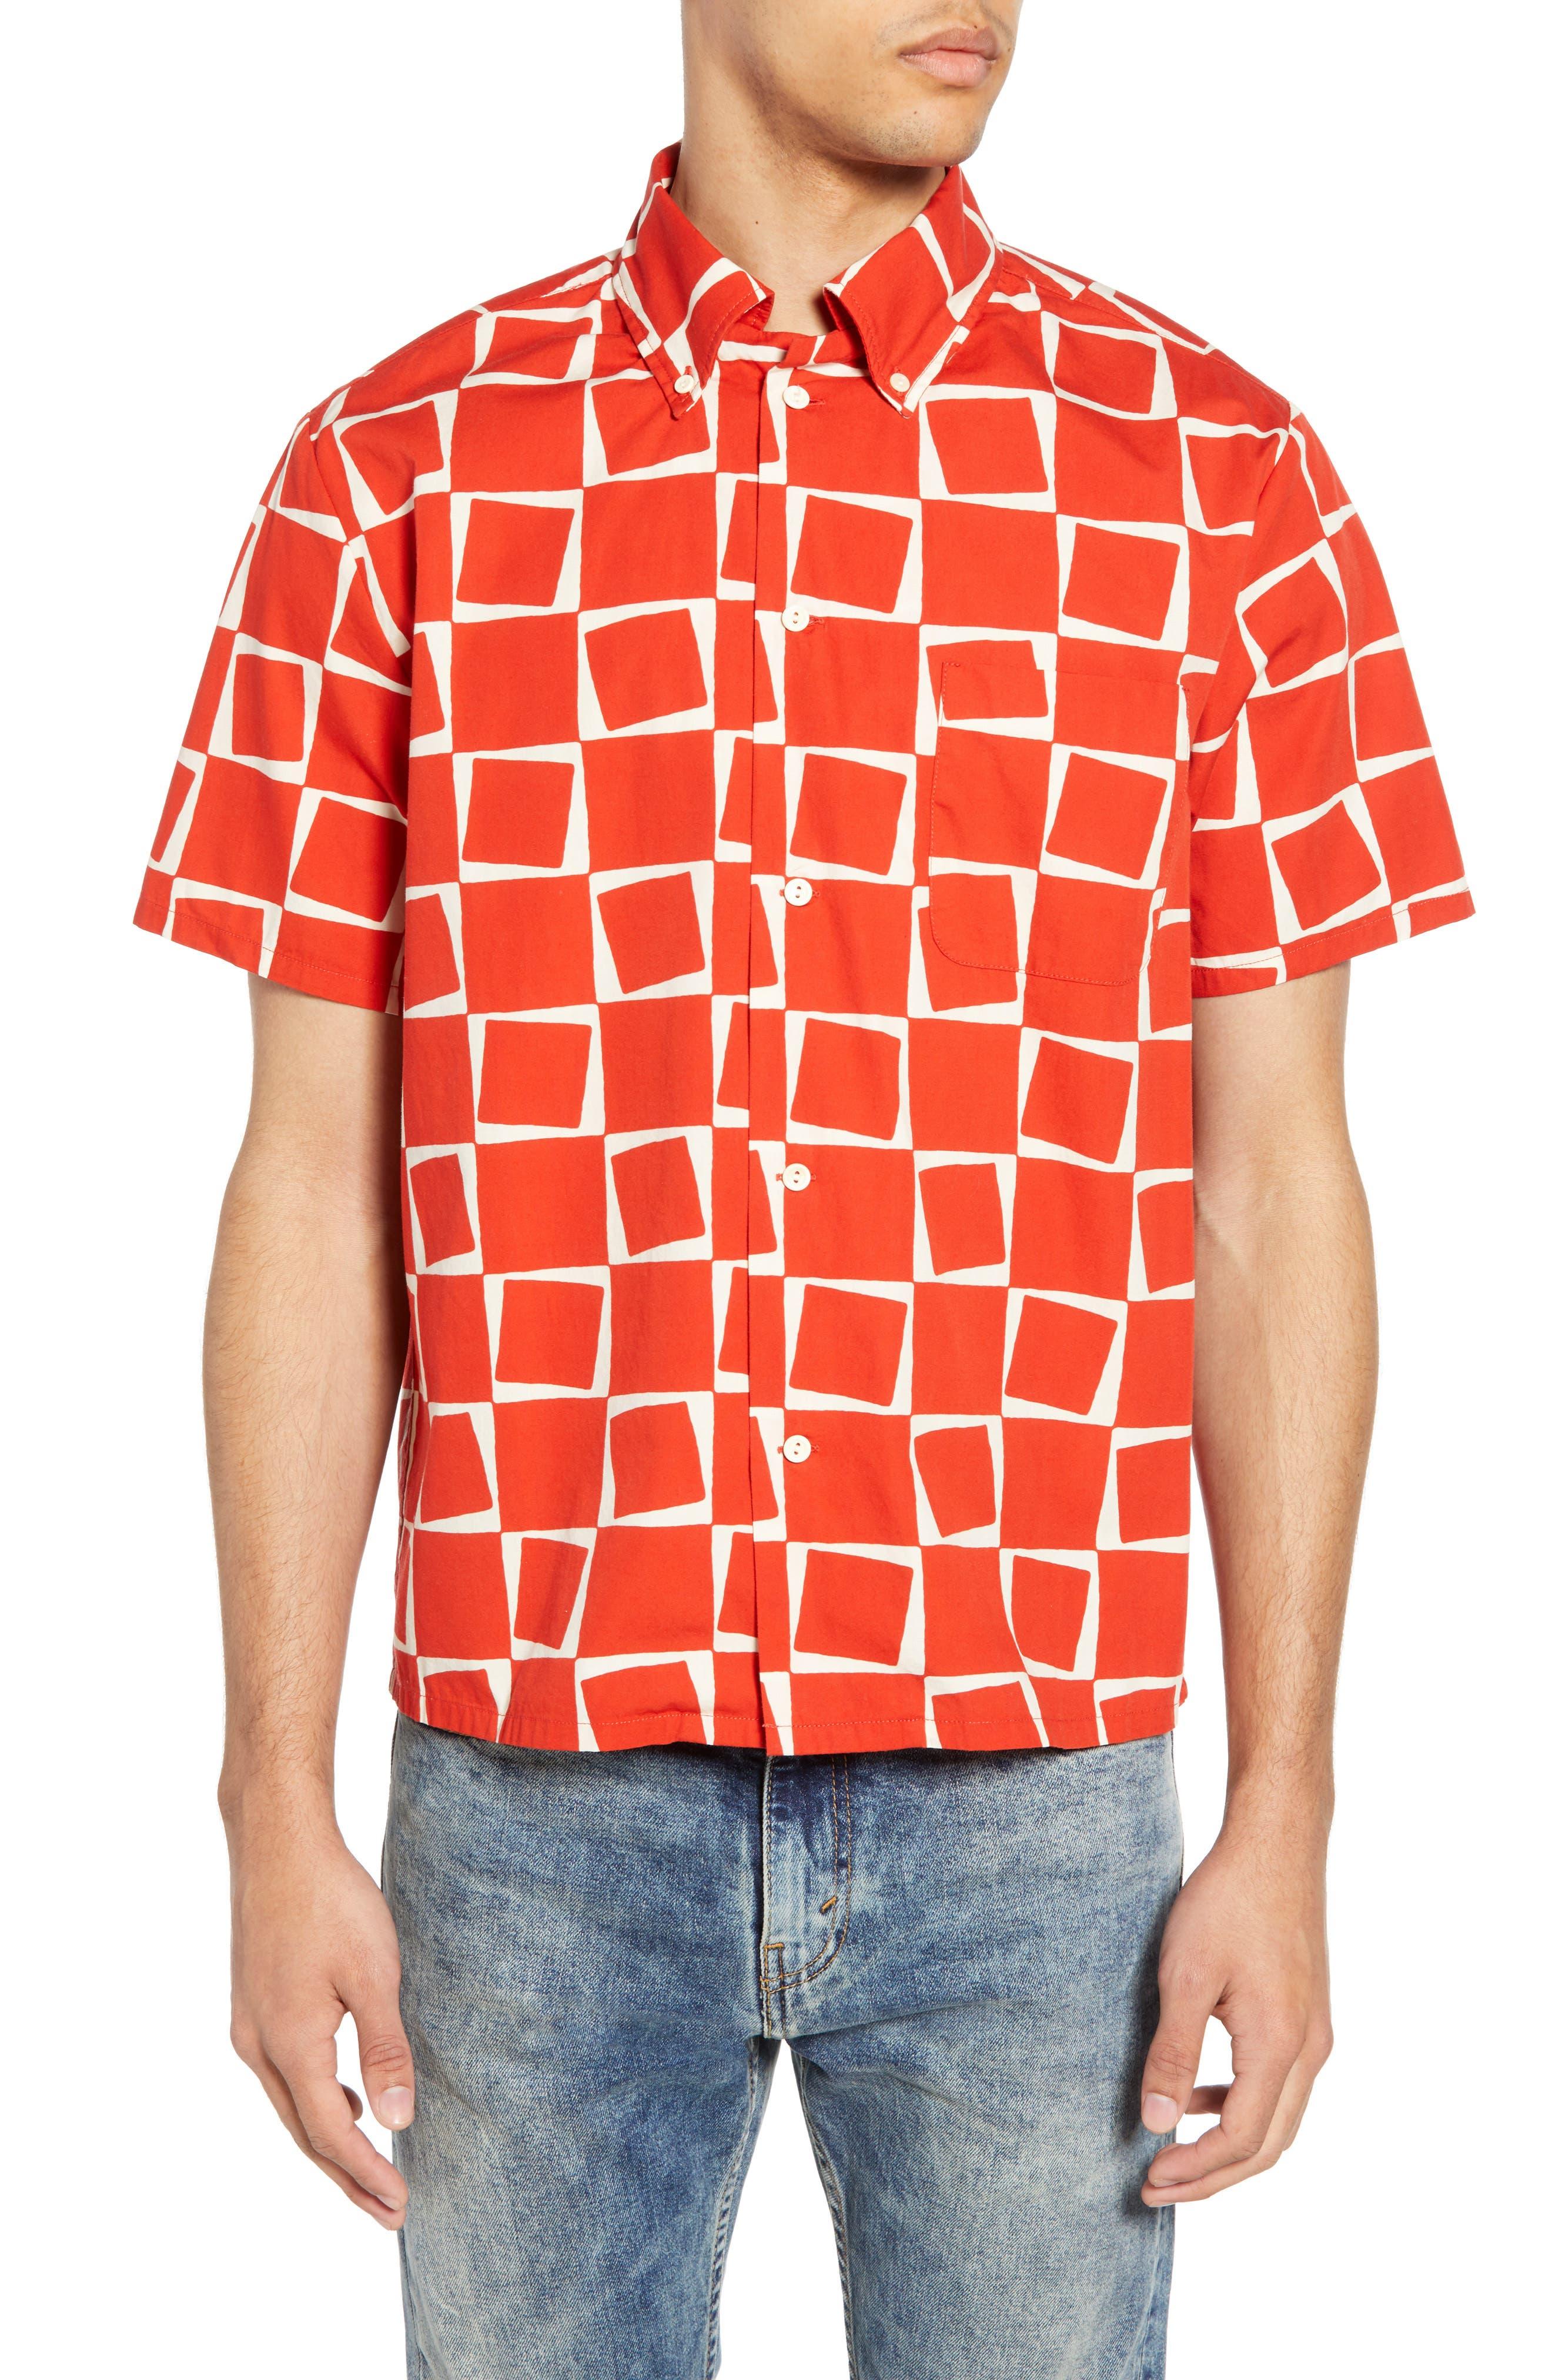 LEVI'S<SUP>®</SUP> VINTAGE CLOTHING, 1950s Regular Atomic Square Woven Shirt, Main thumbnail 1, color, 600